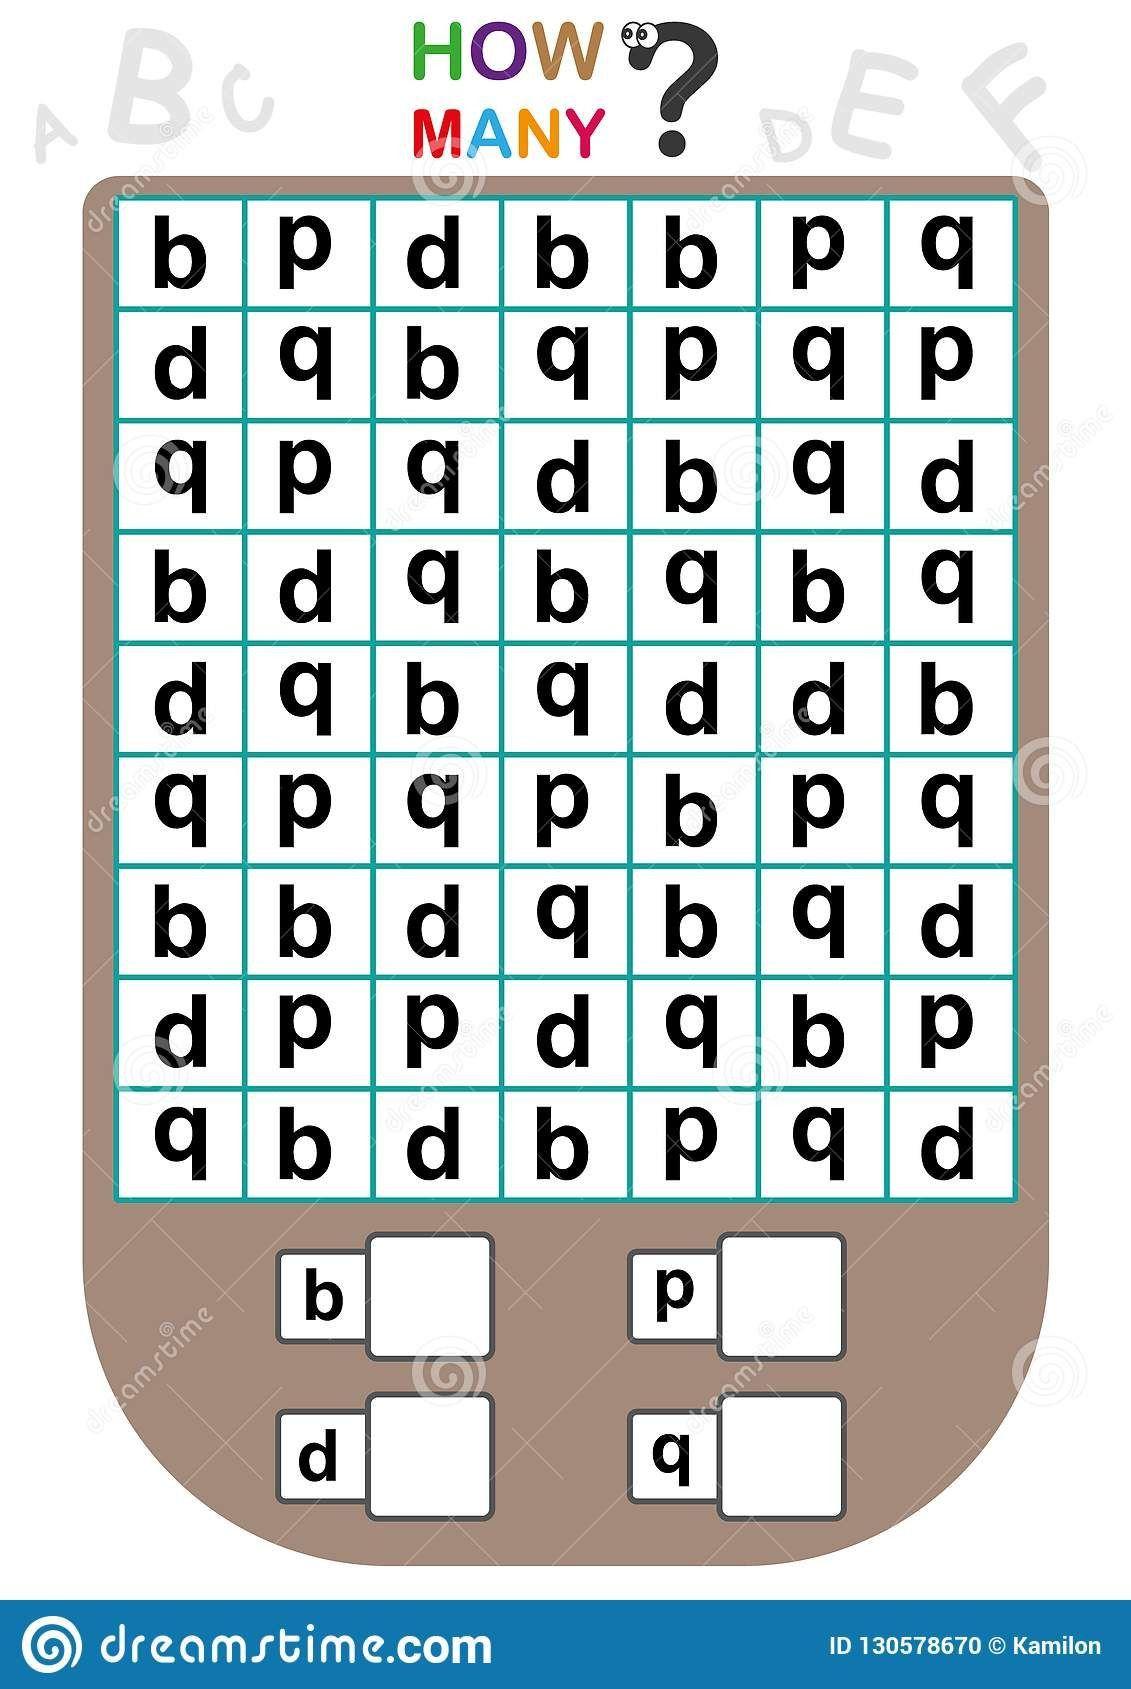 Dyslexia Worksheets For Kindergarten In 2021 Learning Worksheets Kindergarten Worksheets Kindergarten Worksheets Printable